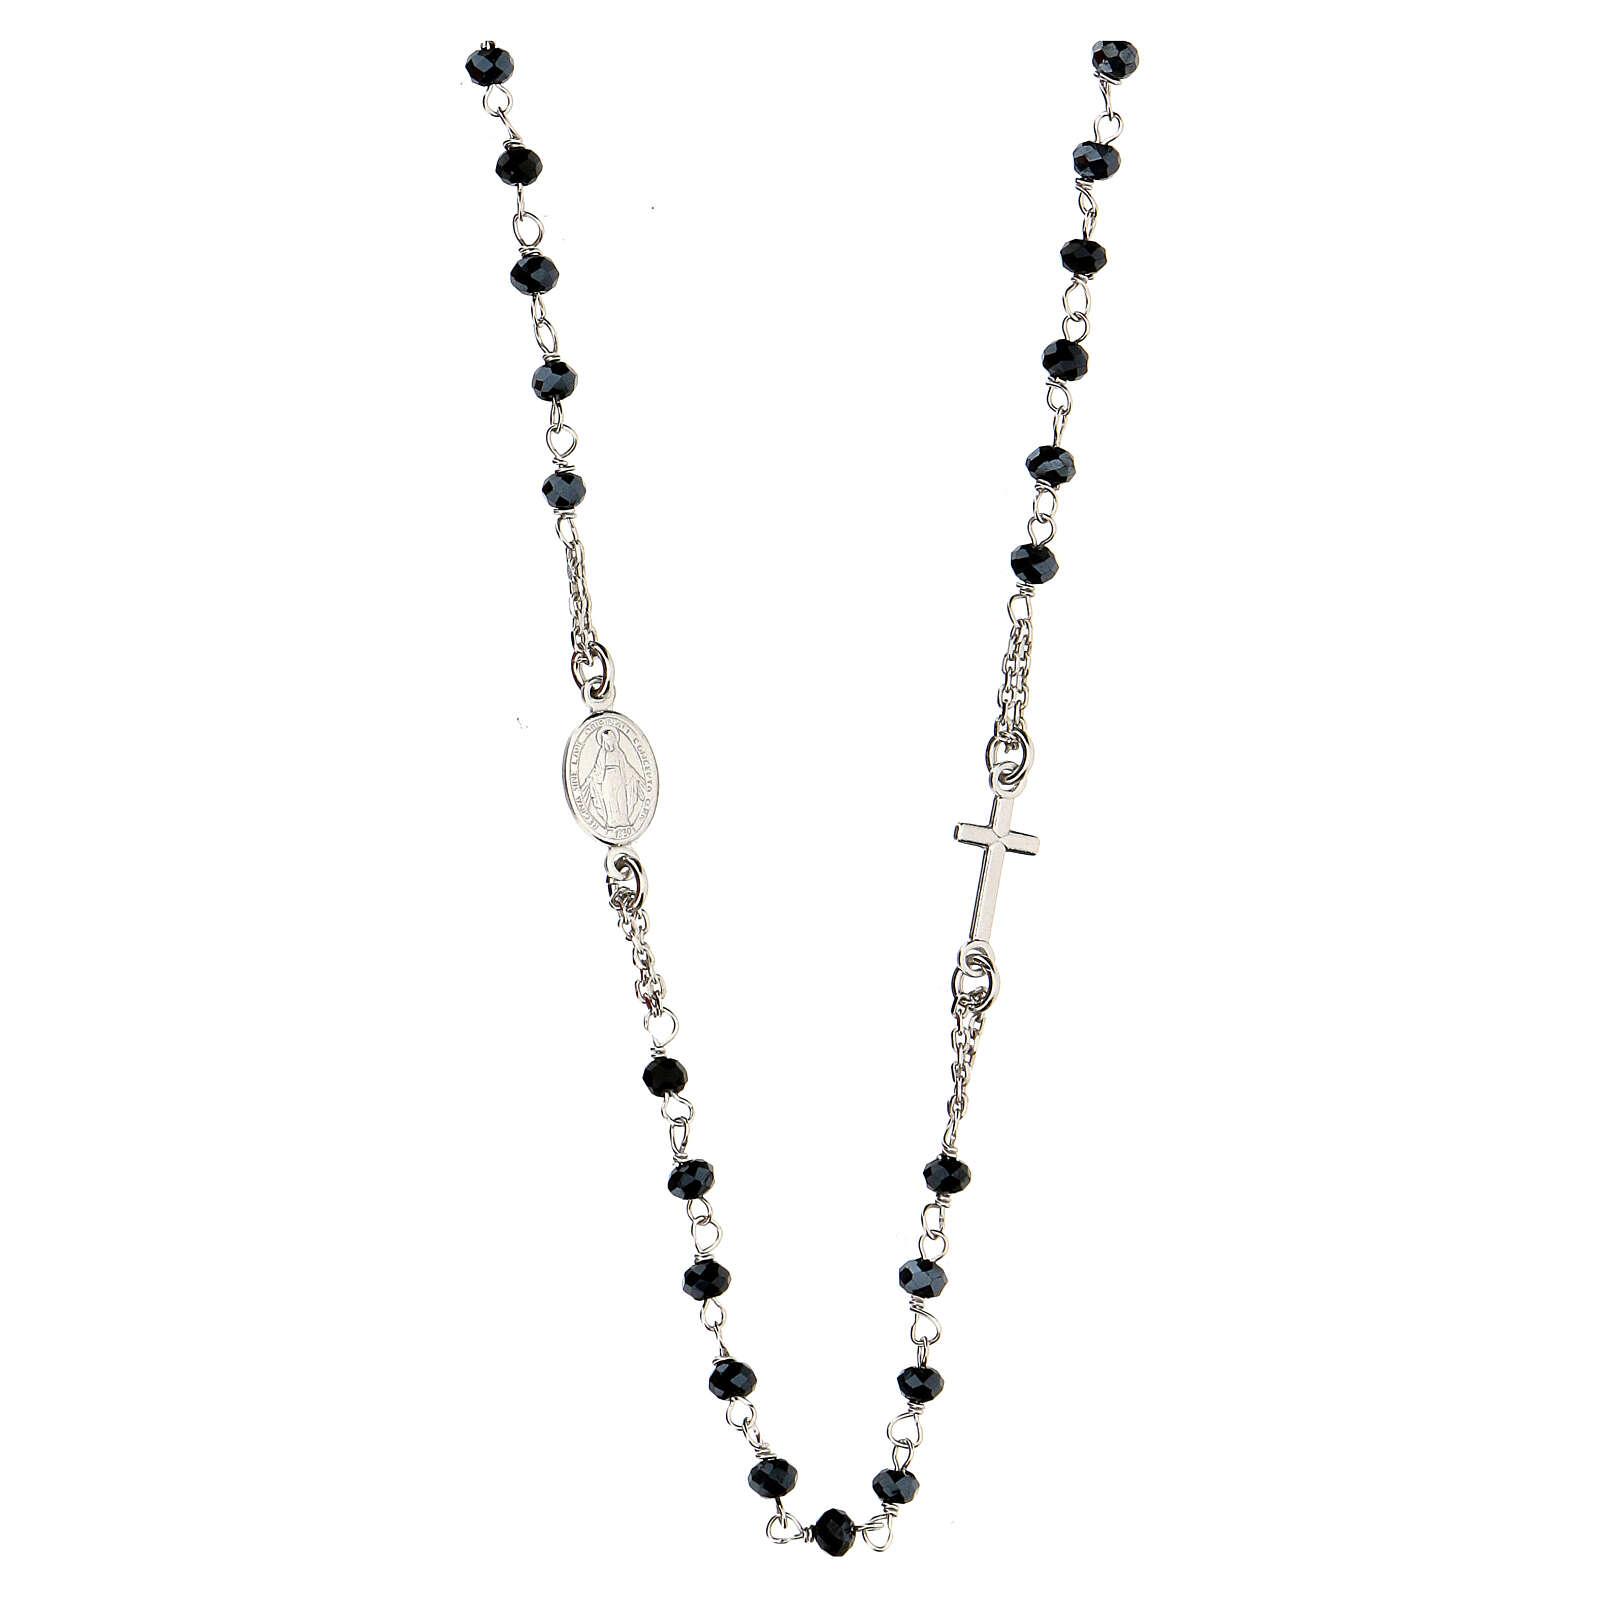 Rosary Necklace AMEN classic Pavè black crystals, silver 925 Rhodium 4